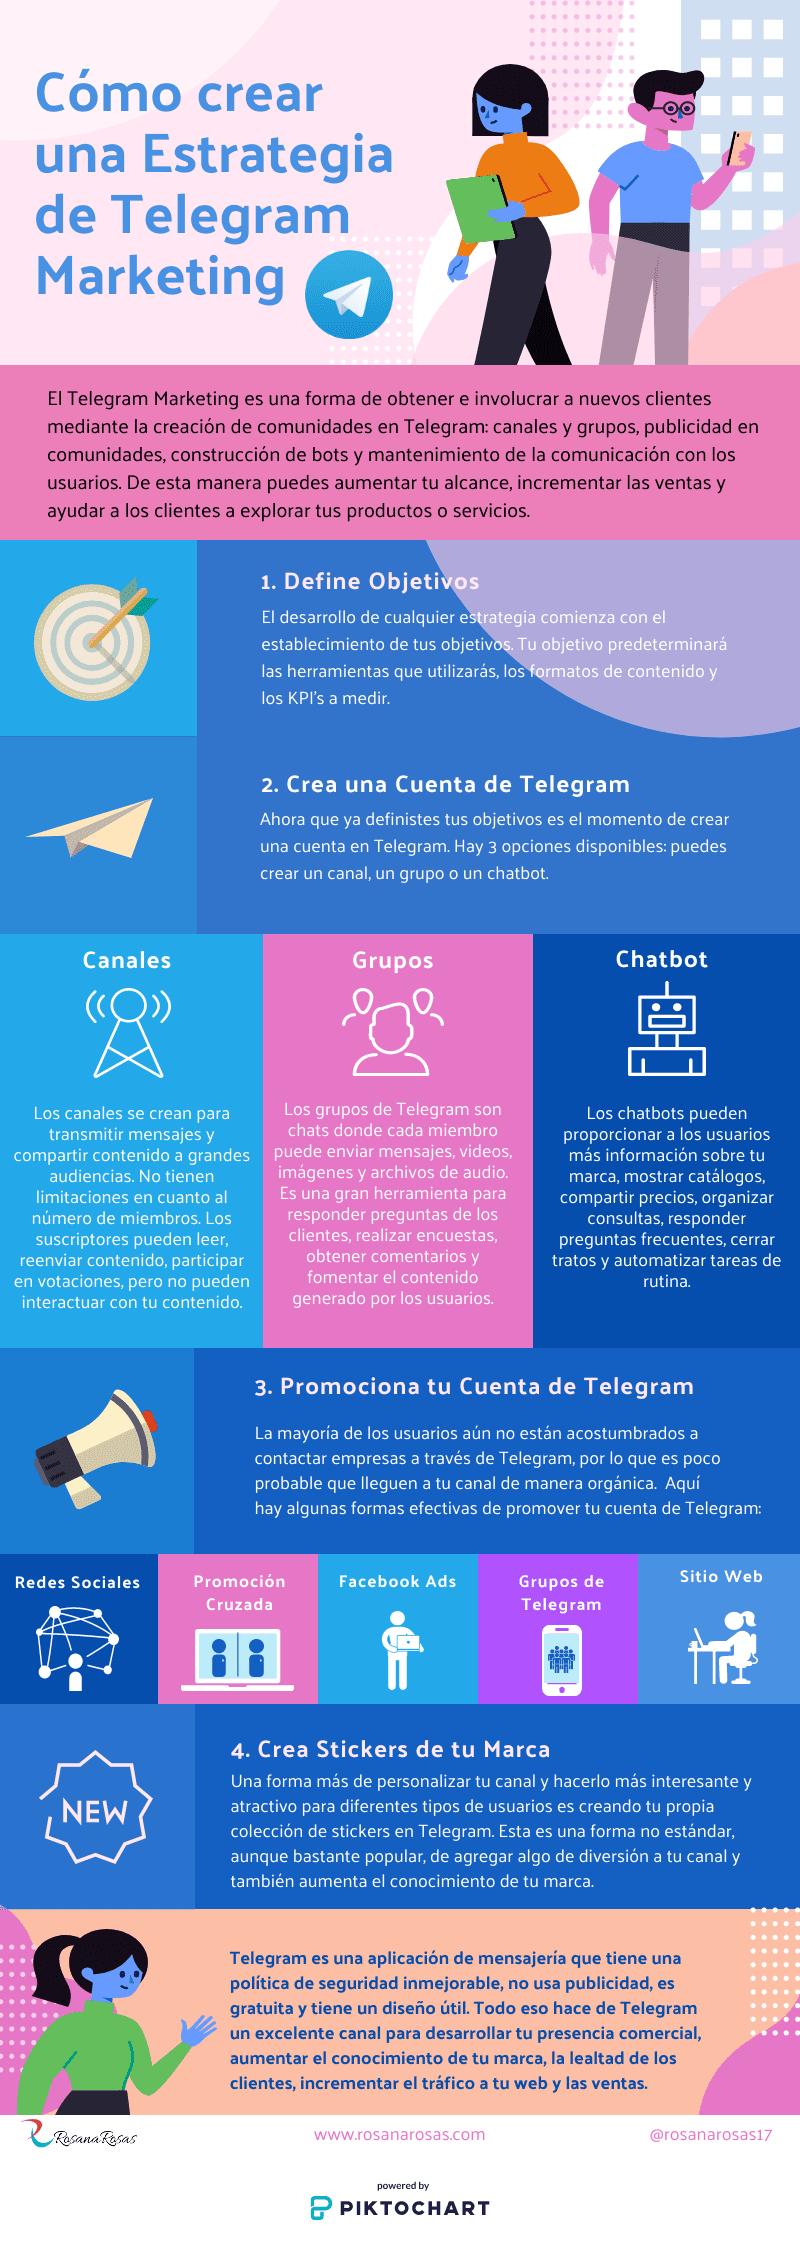 Infografia Estrategia de Telegram Marketing